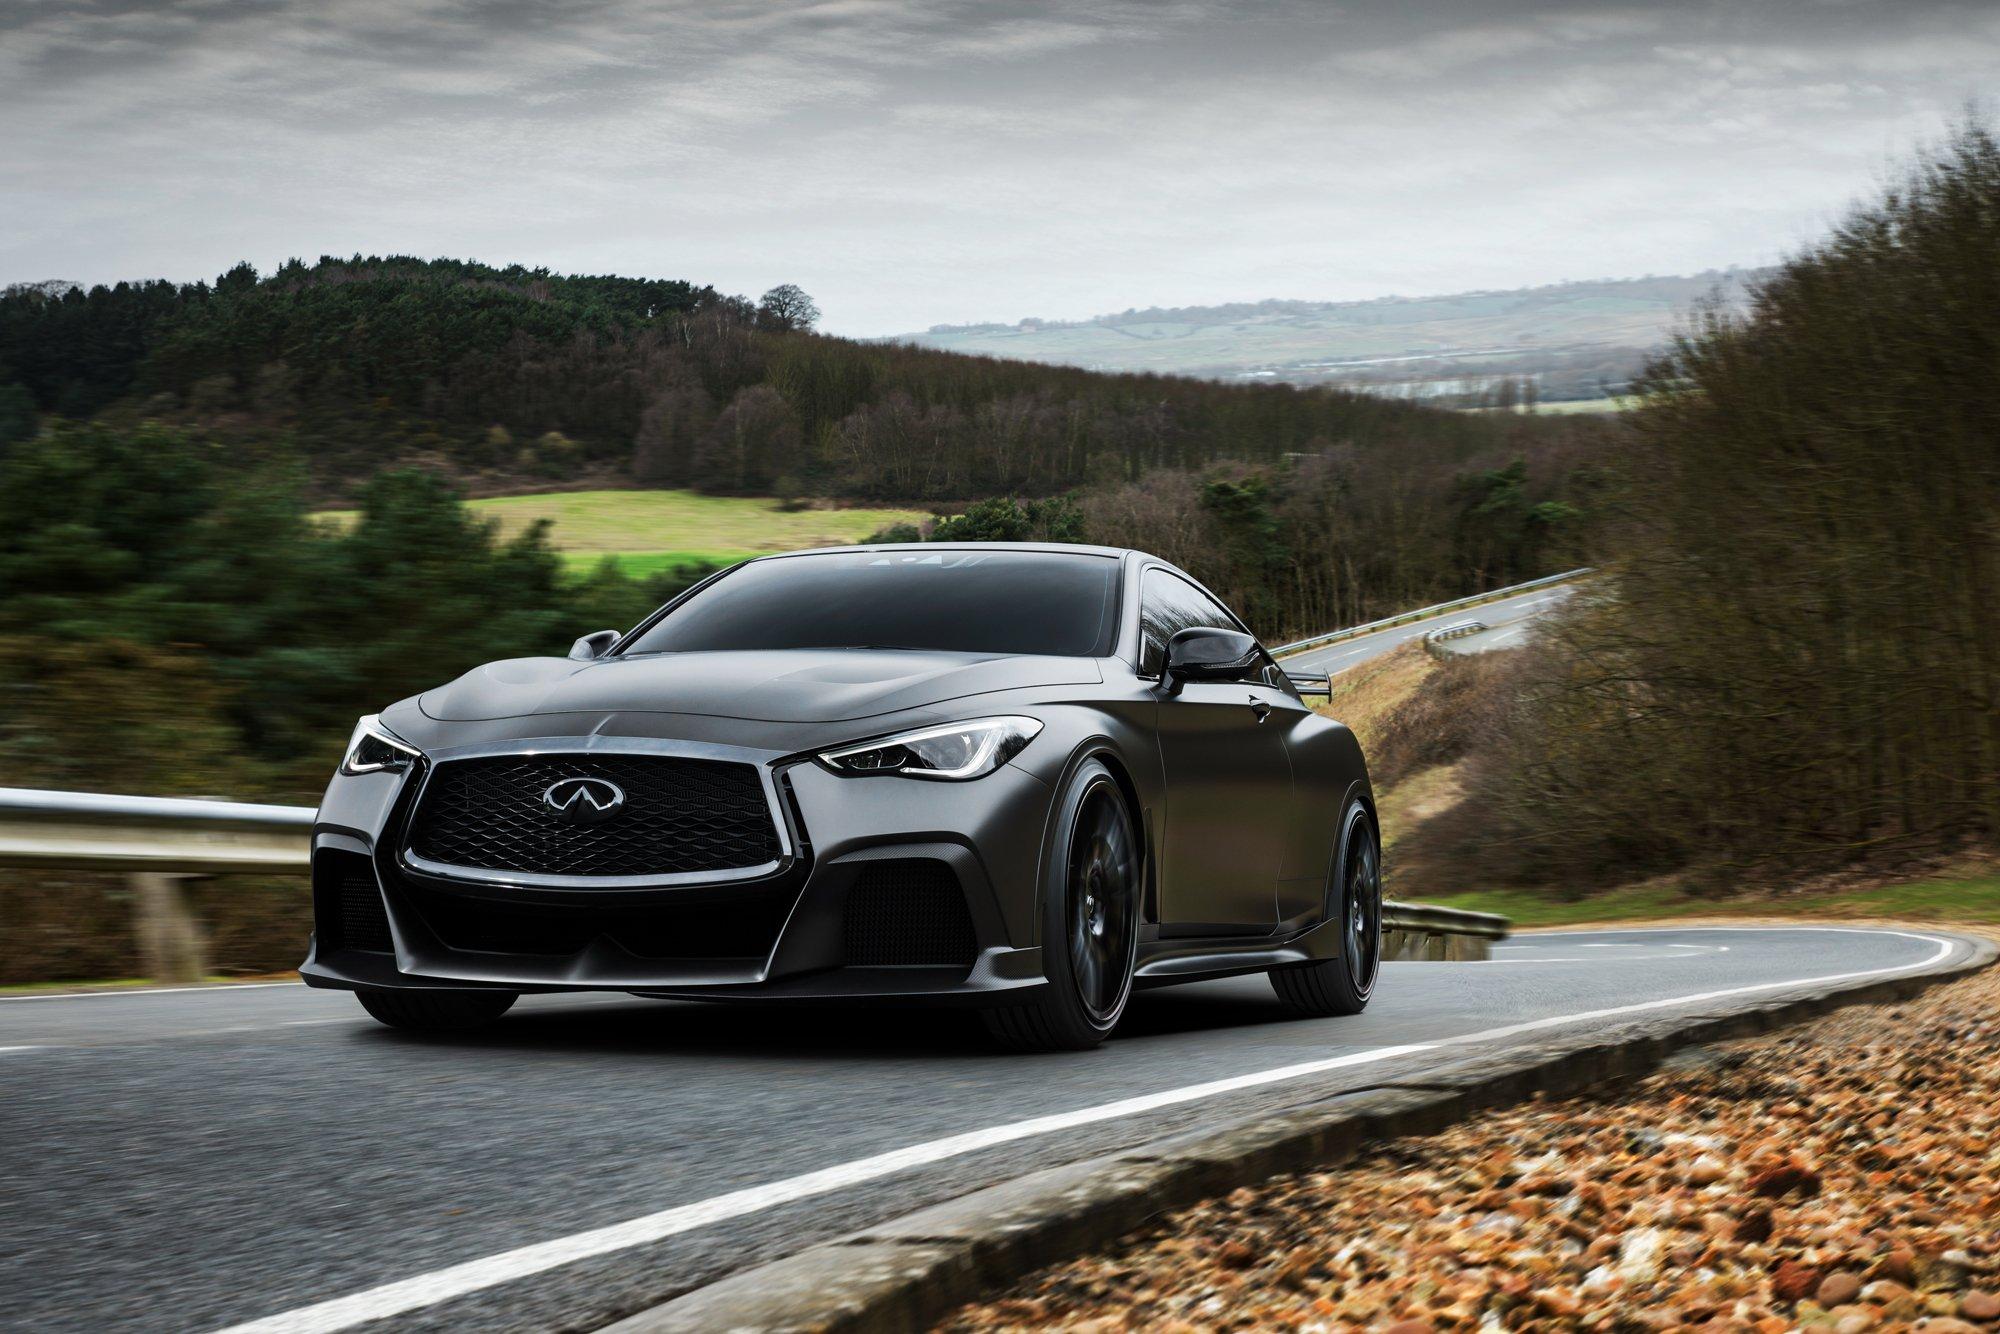 Infiniti Project Black S mit F1-Hybridantrieb